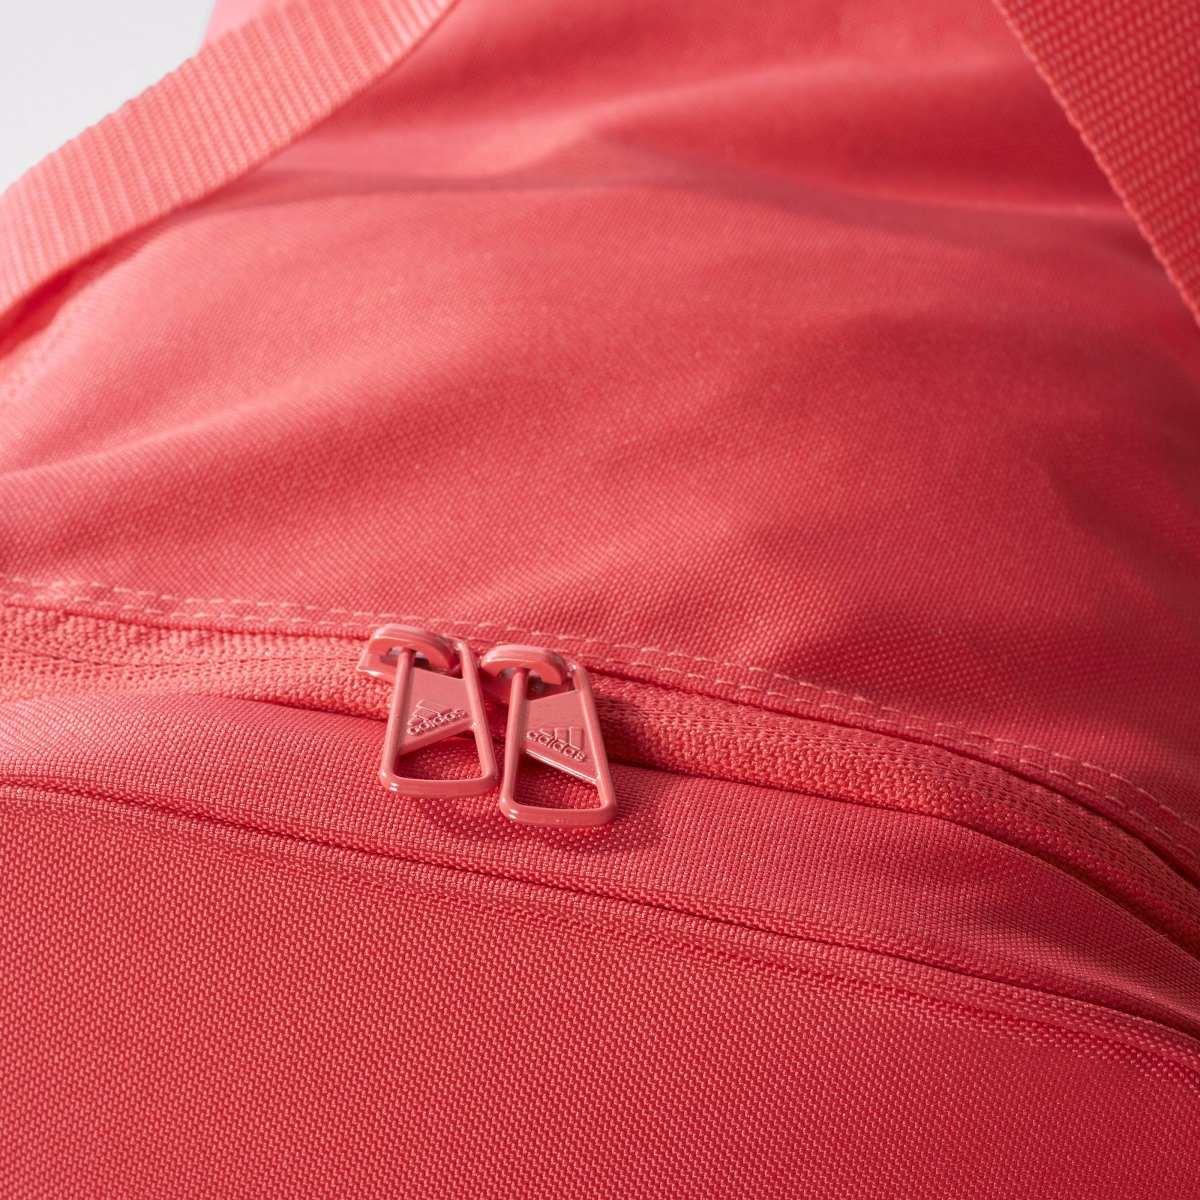 ca7a6ca4de988 bolso deportivo adidas mujer rosa original importado. Cargando zoom.